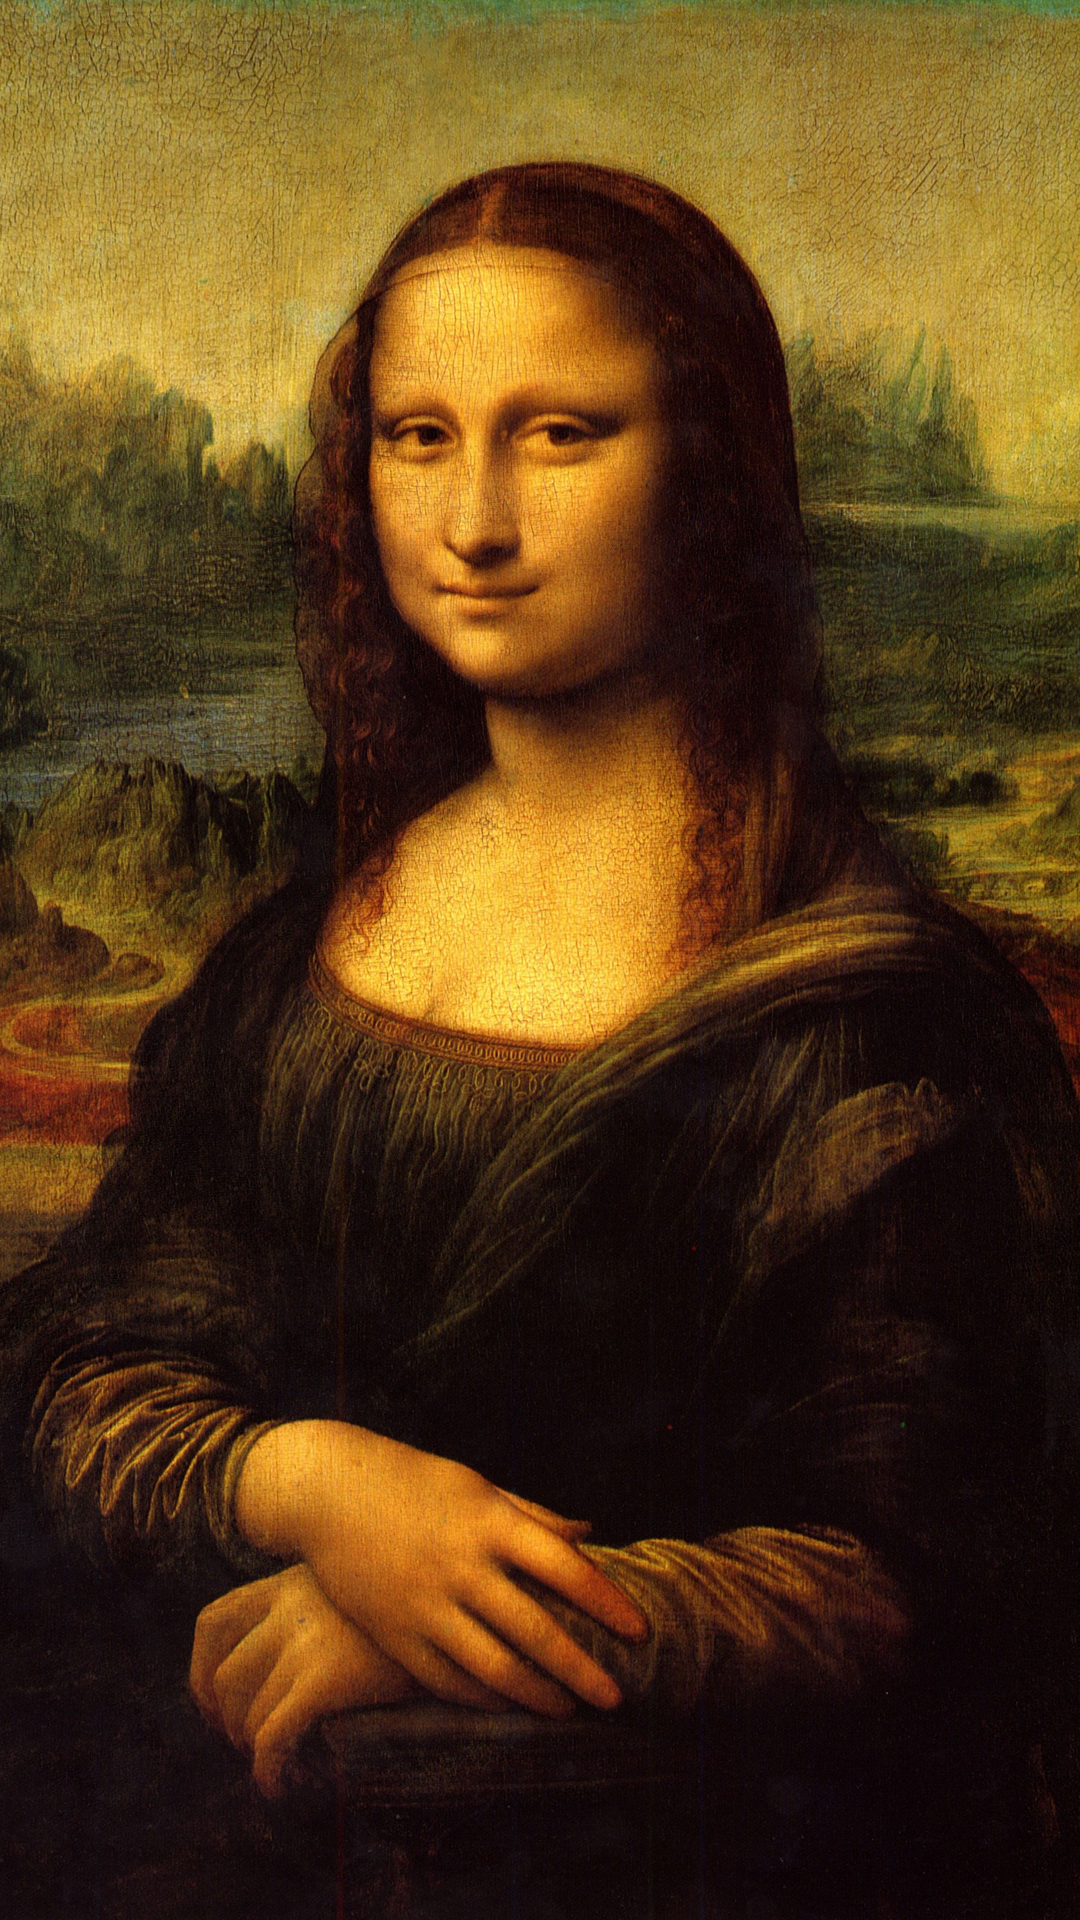 Mona Lisa htc one wallpaper